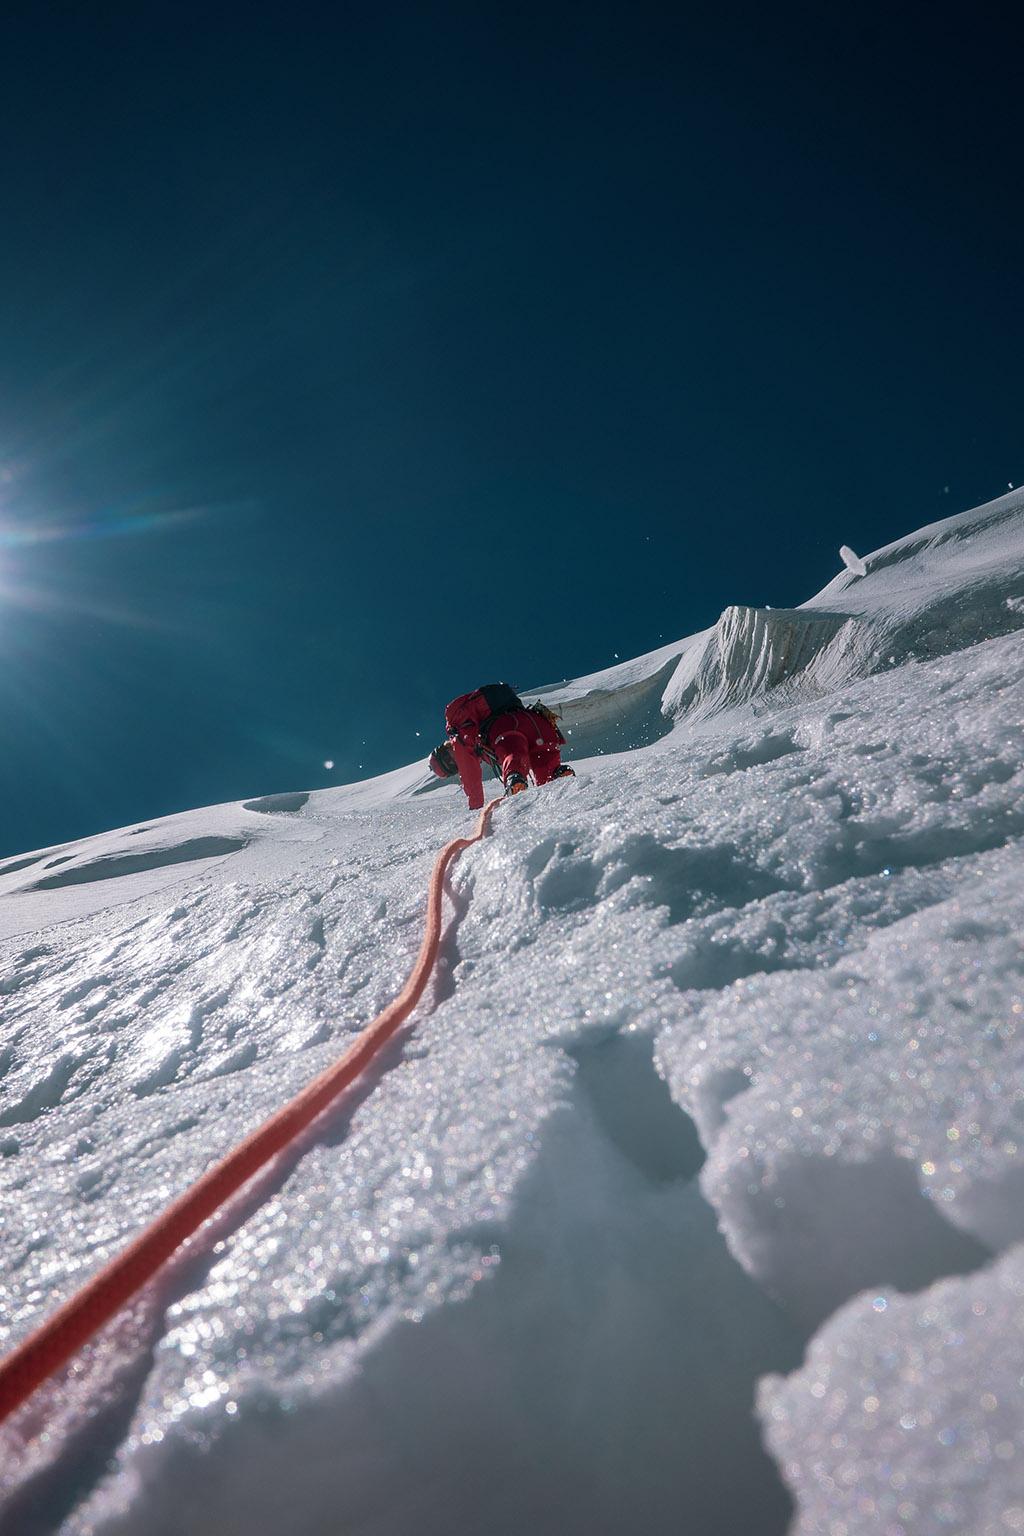 summitting a mountain